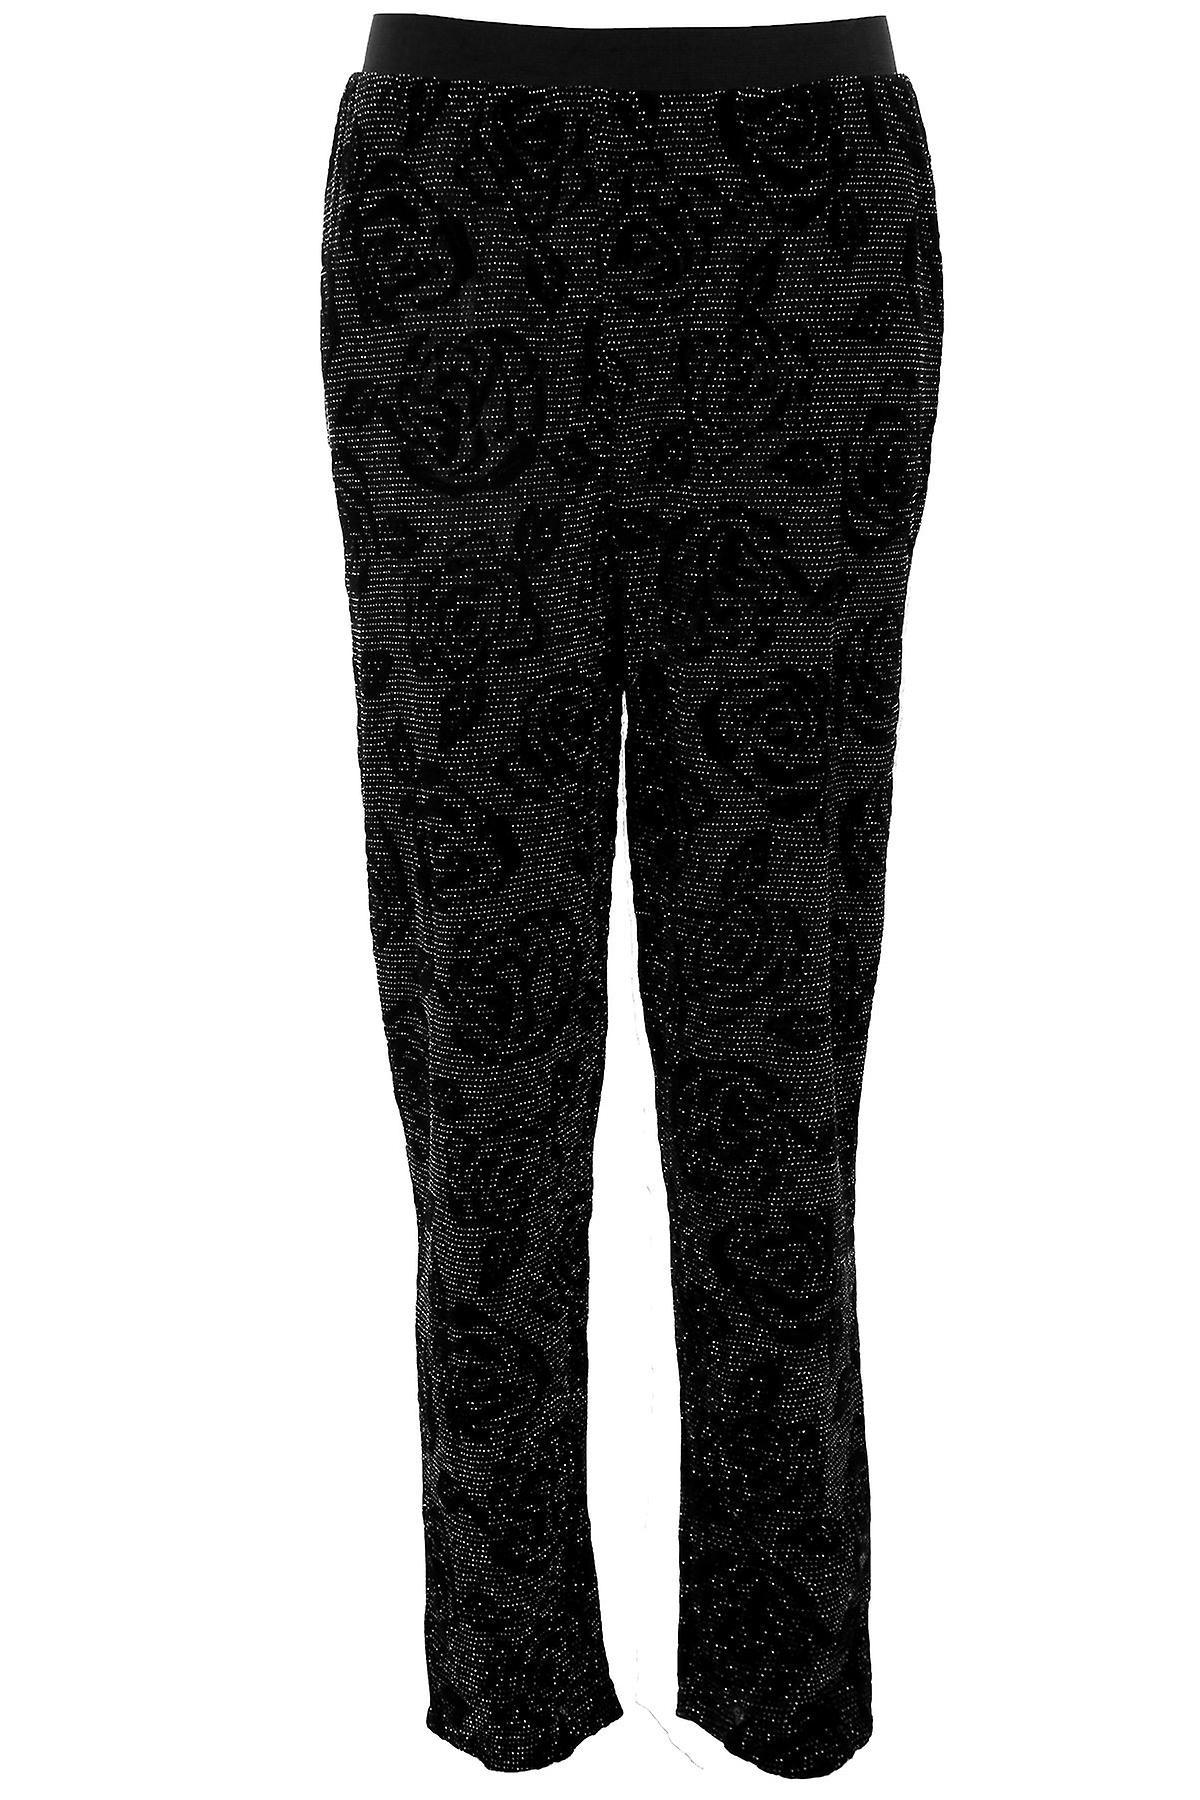 Ladies Lurex Floral Flock Print Sparkly Women's Harem Baggy Loose Fit Trousers